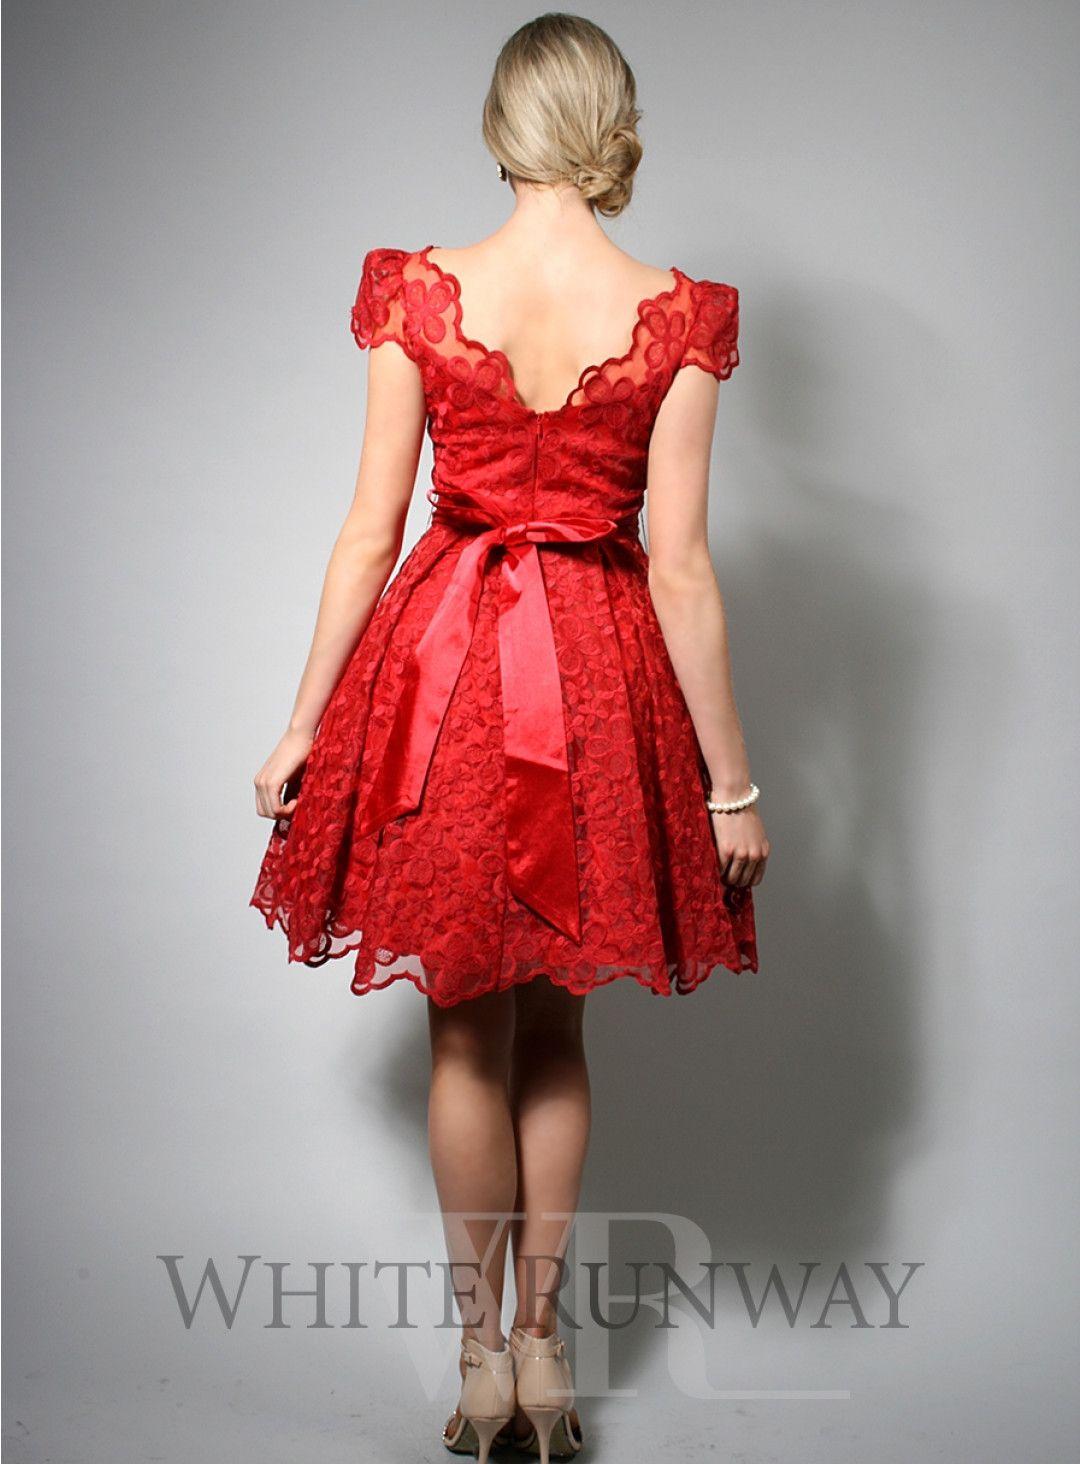 Elizabeth dress a pretty cocktail length dress for your bridesmaids